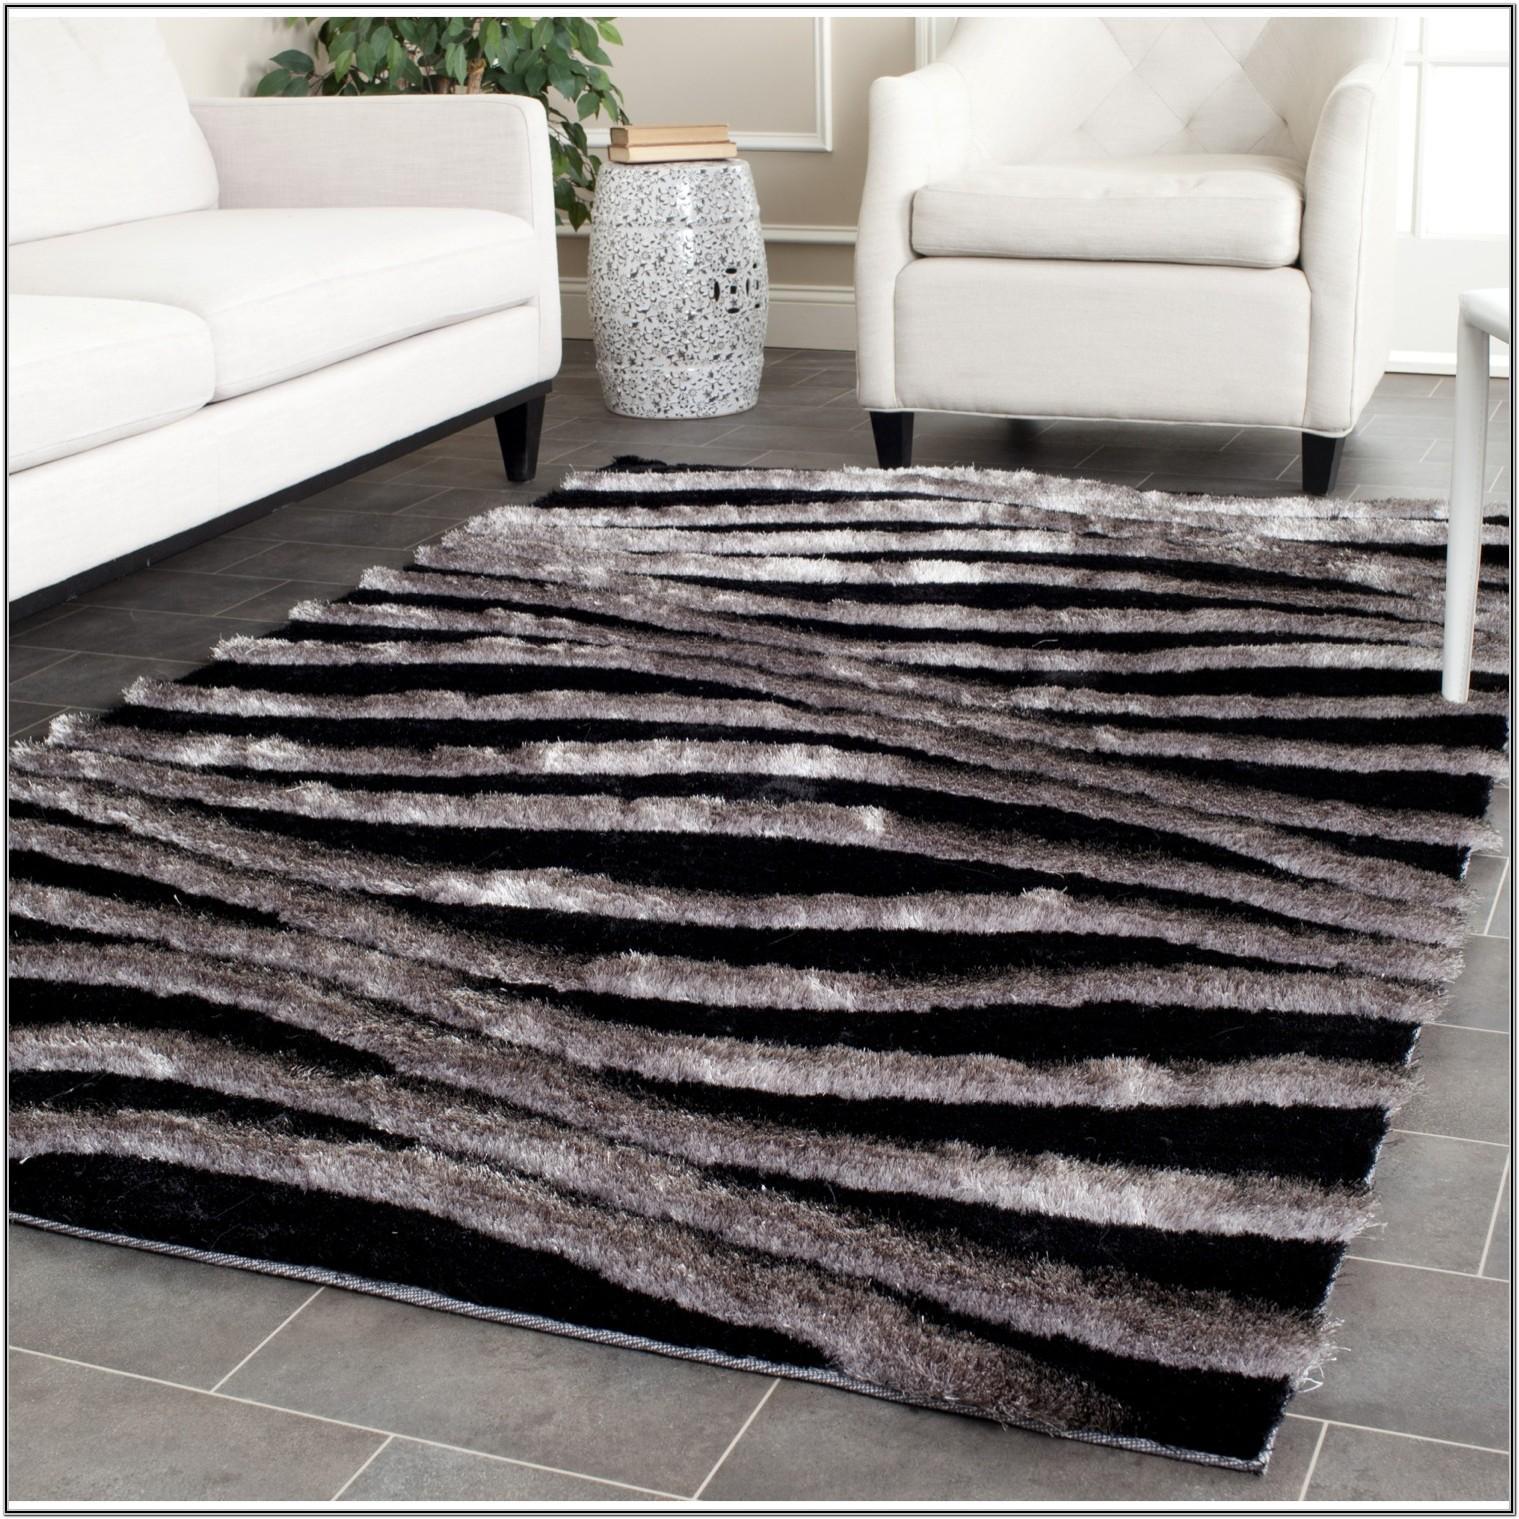 3d Rugs For Living Room